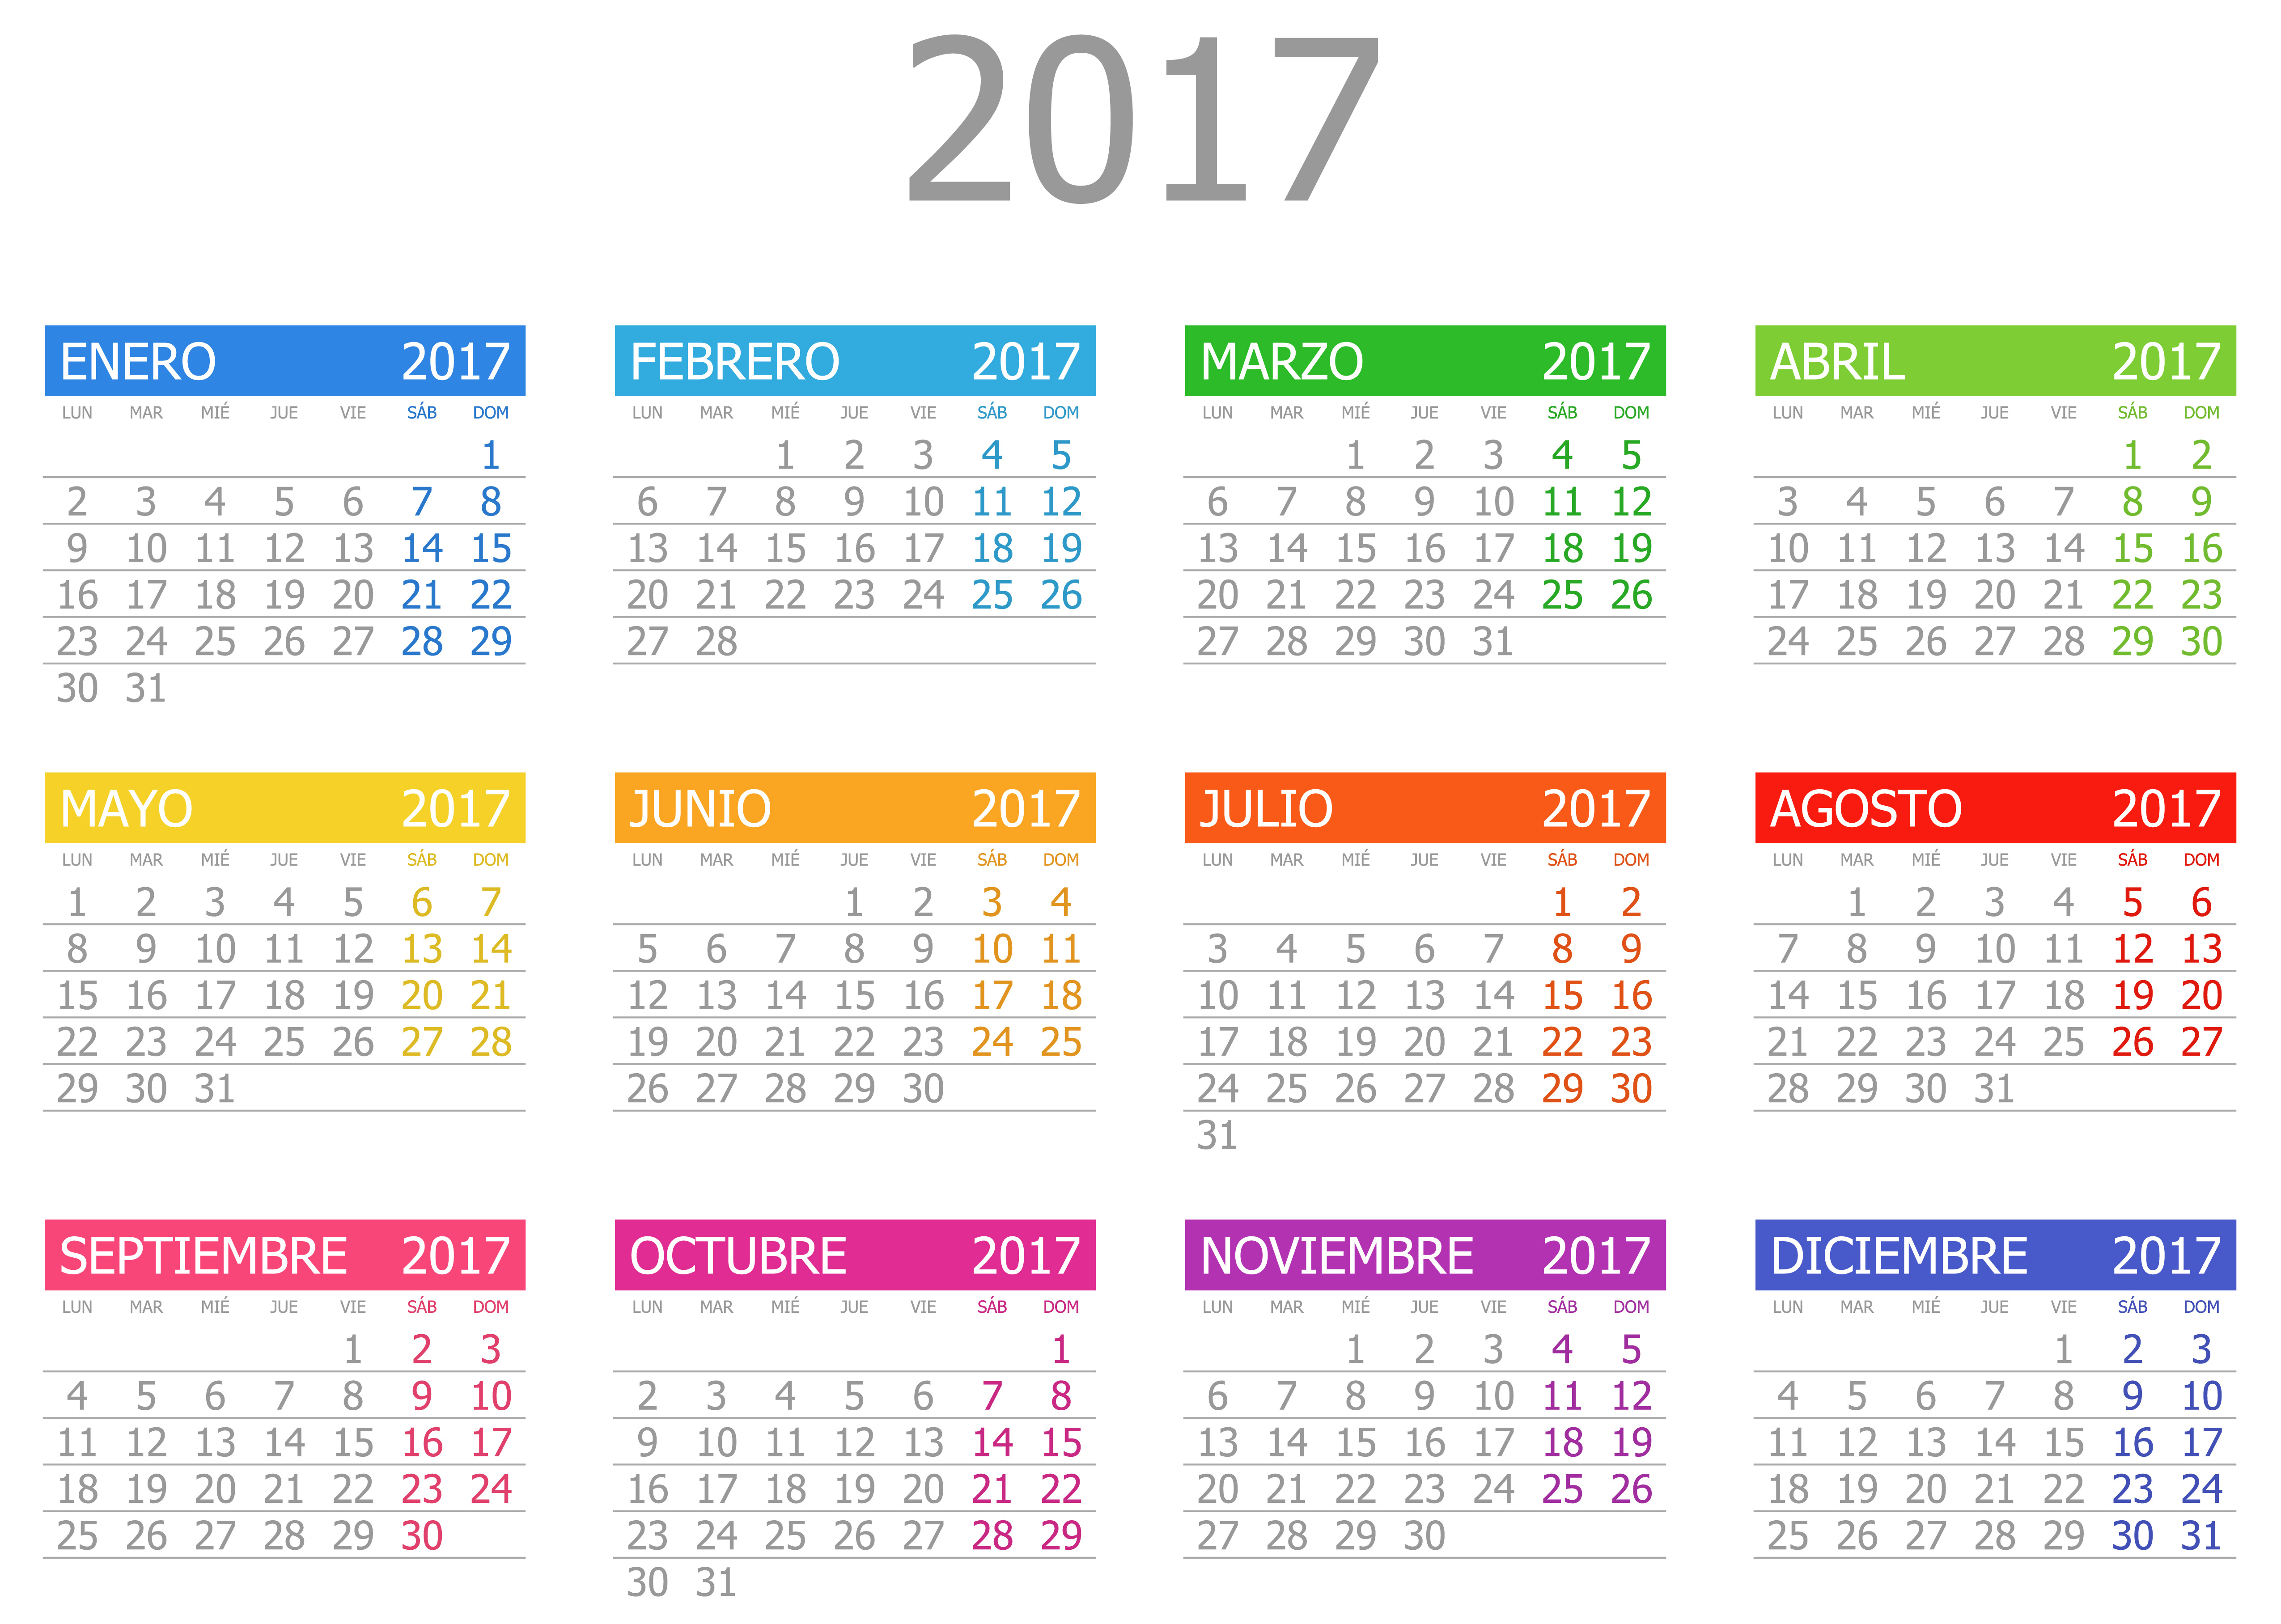 Calendario 2017 Imagenes Educativas